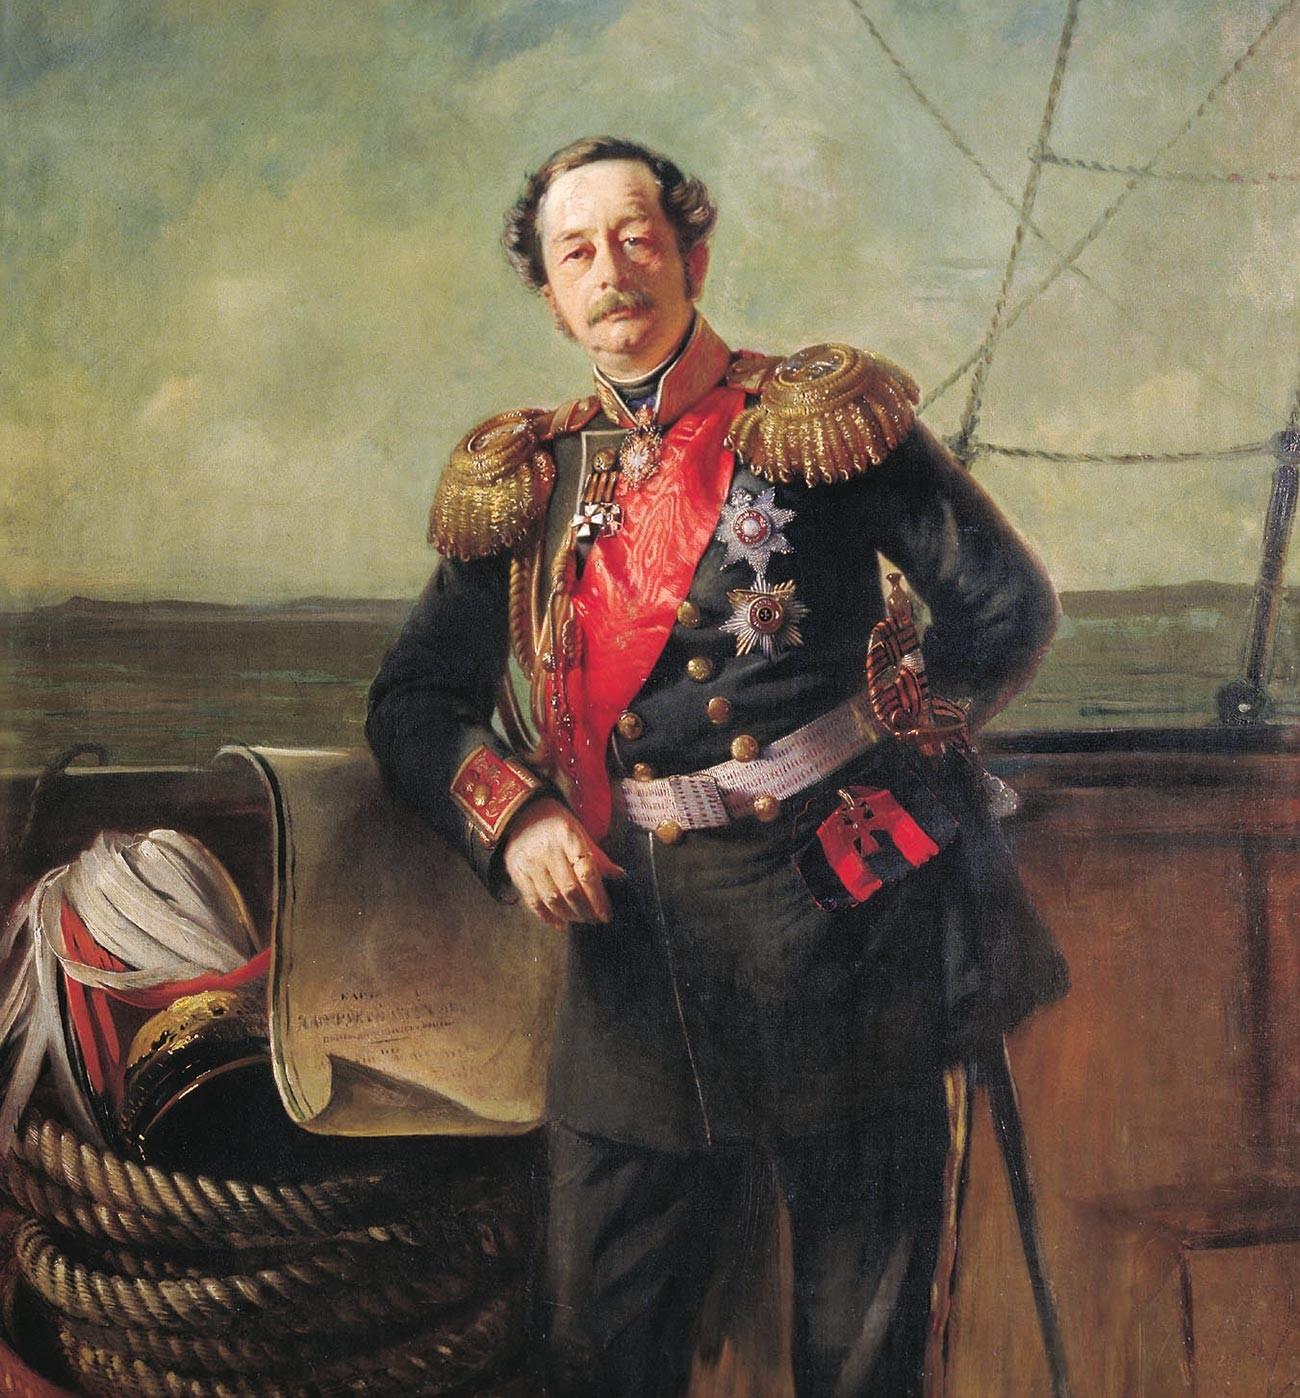 Retrato do conde Nikolai Nikolaevich Muraviov-Amurski.